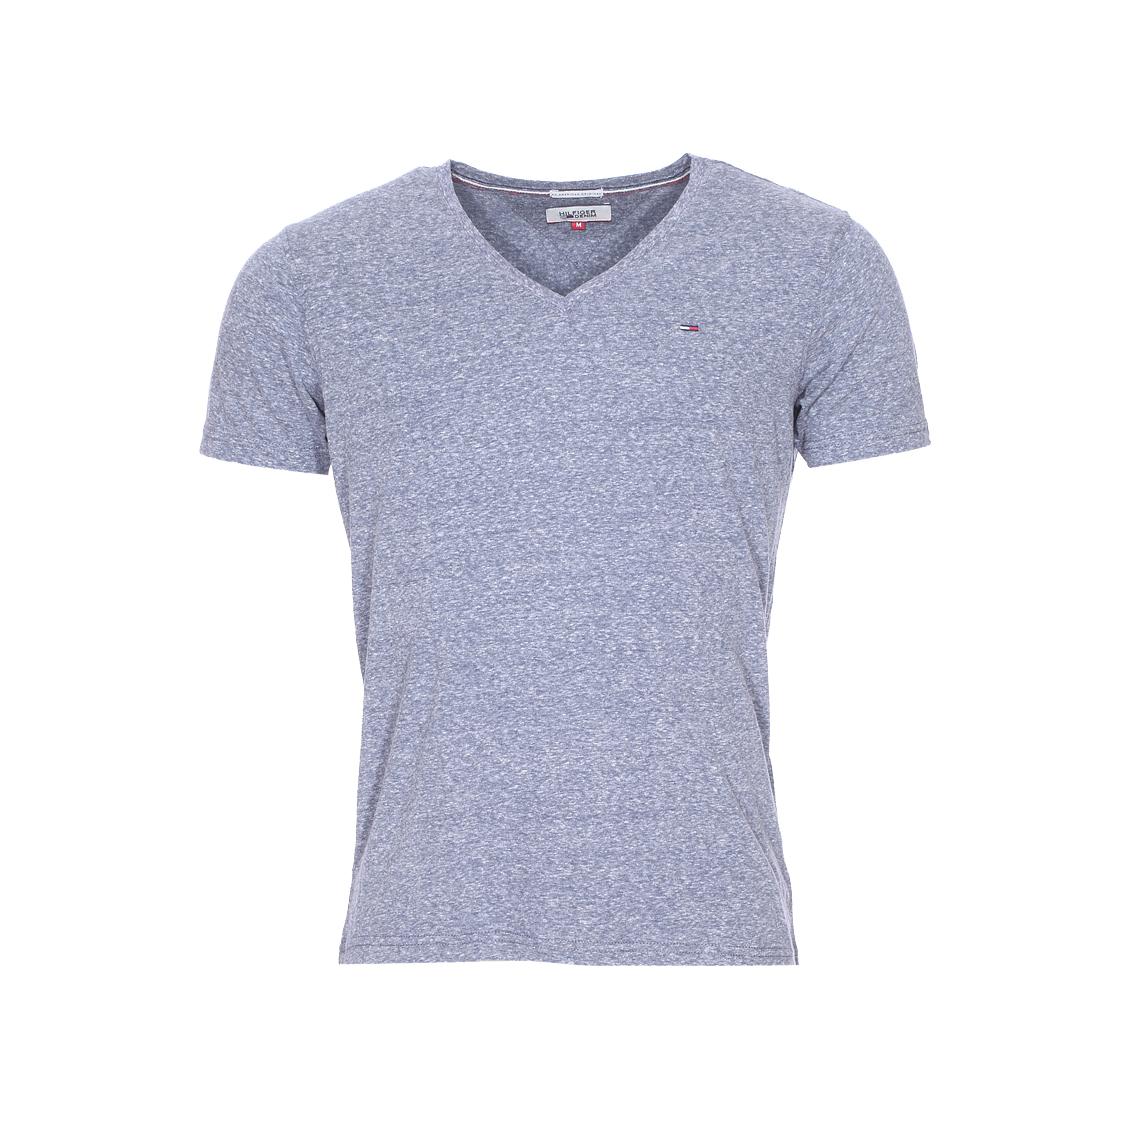 Tee-shirt col v  en coton mélangé bleu chiné